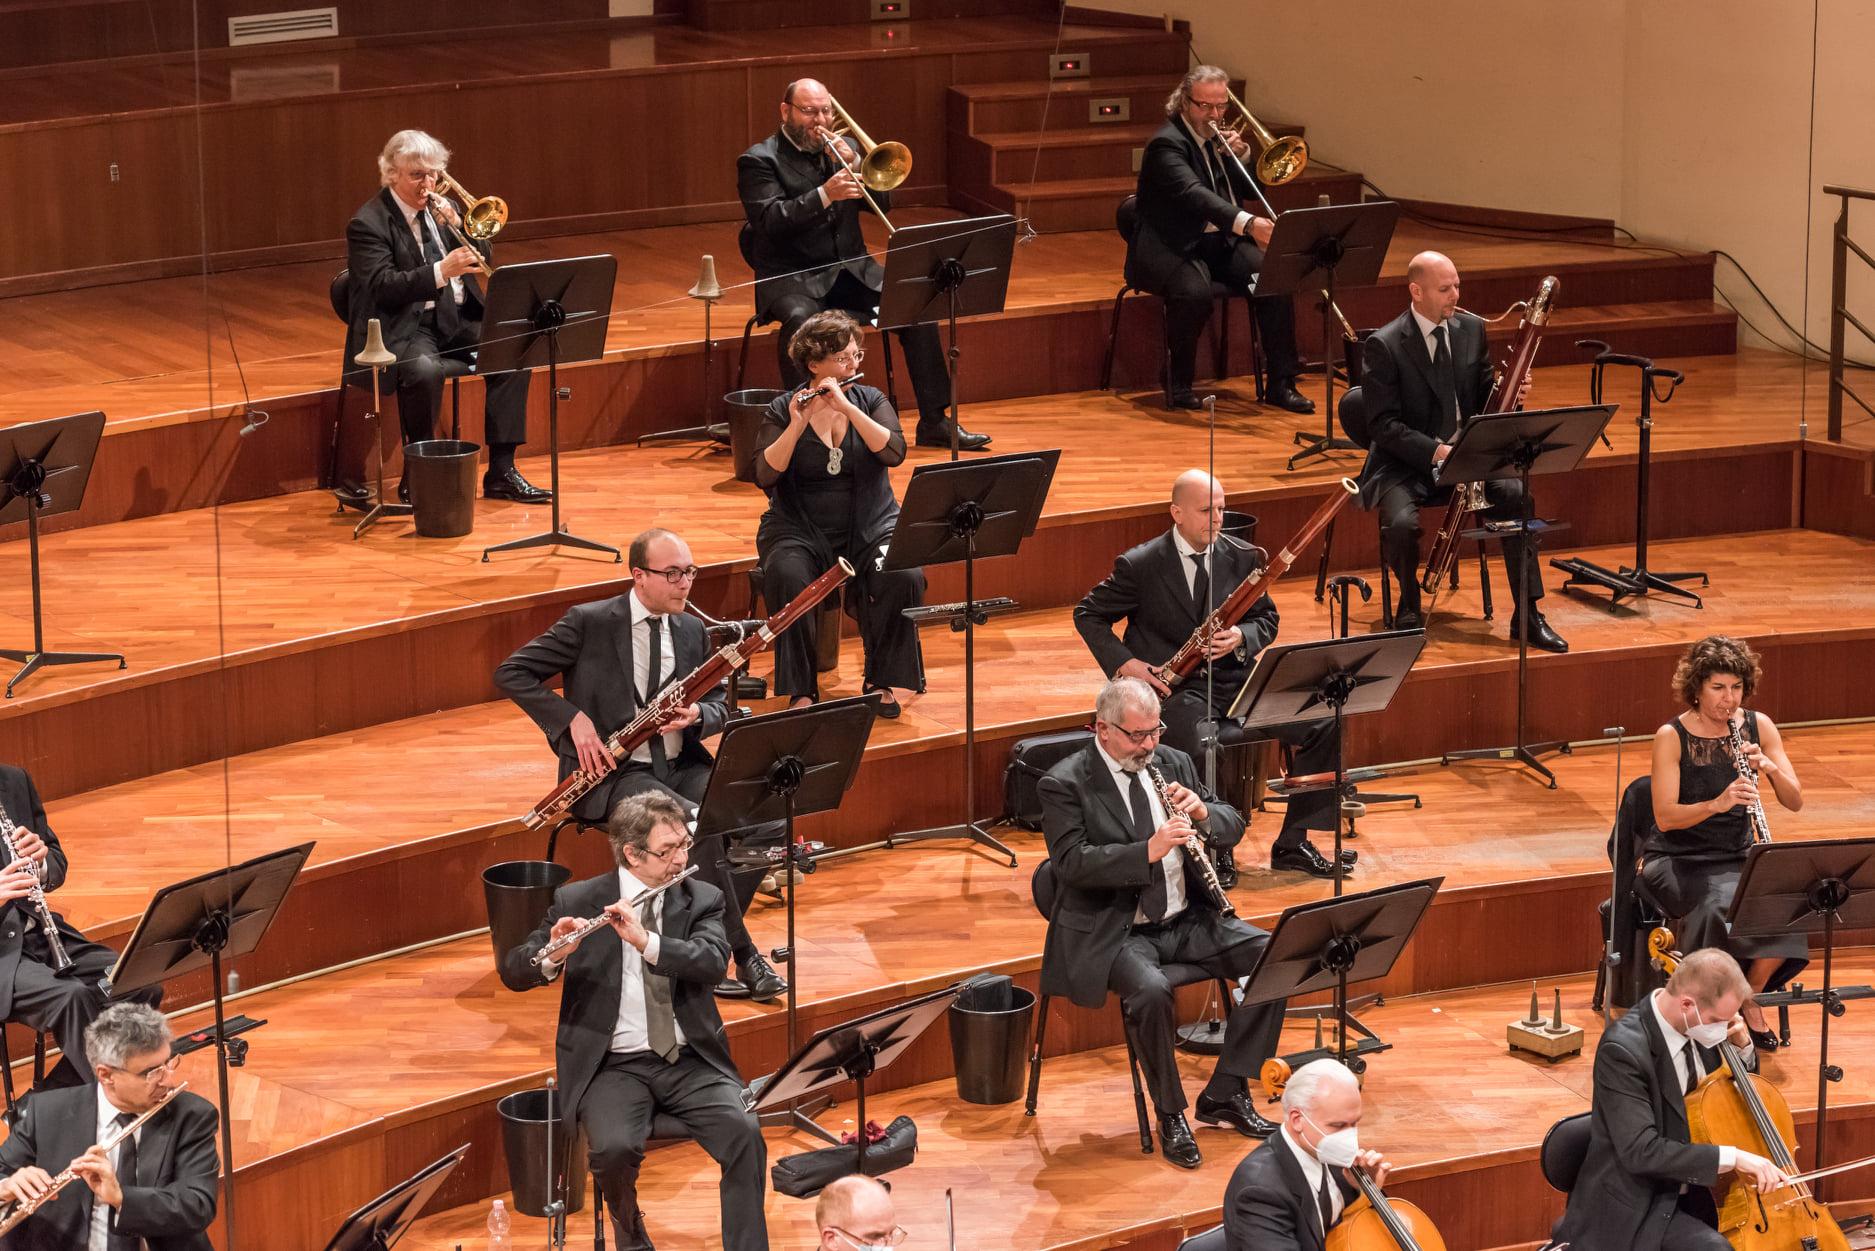 Credits: Più Luce per Orchestra Rai